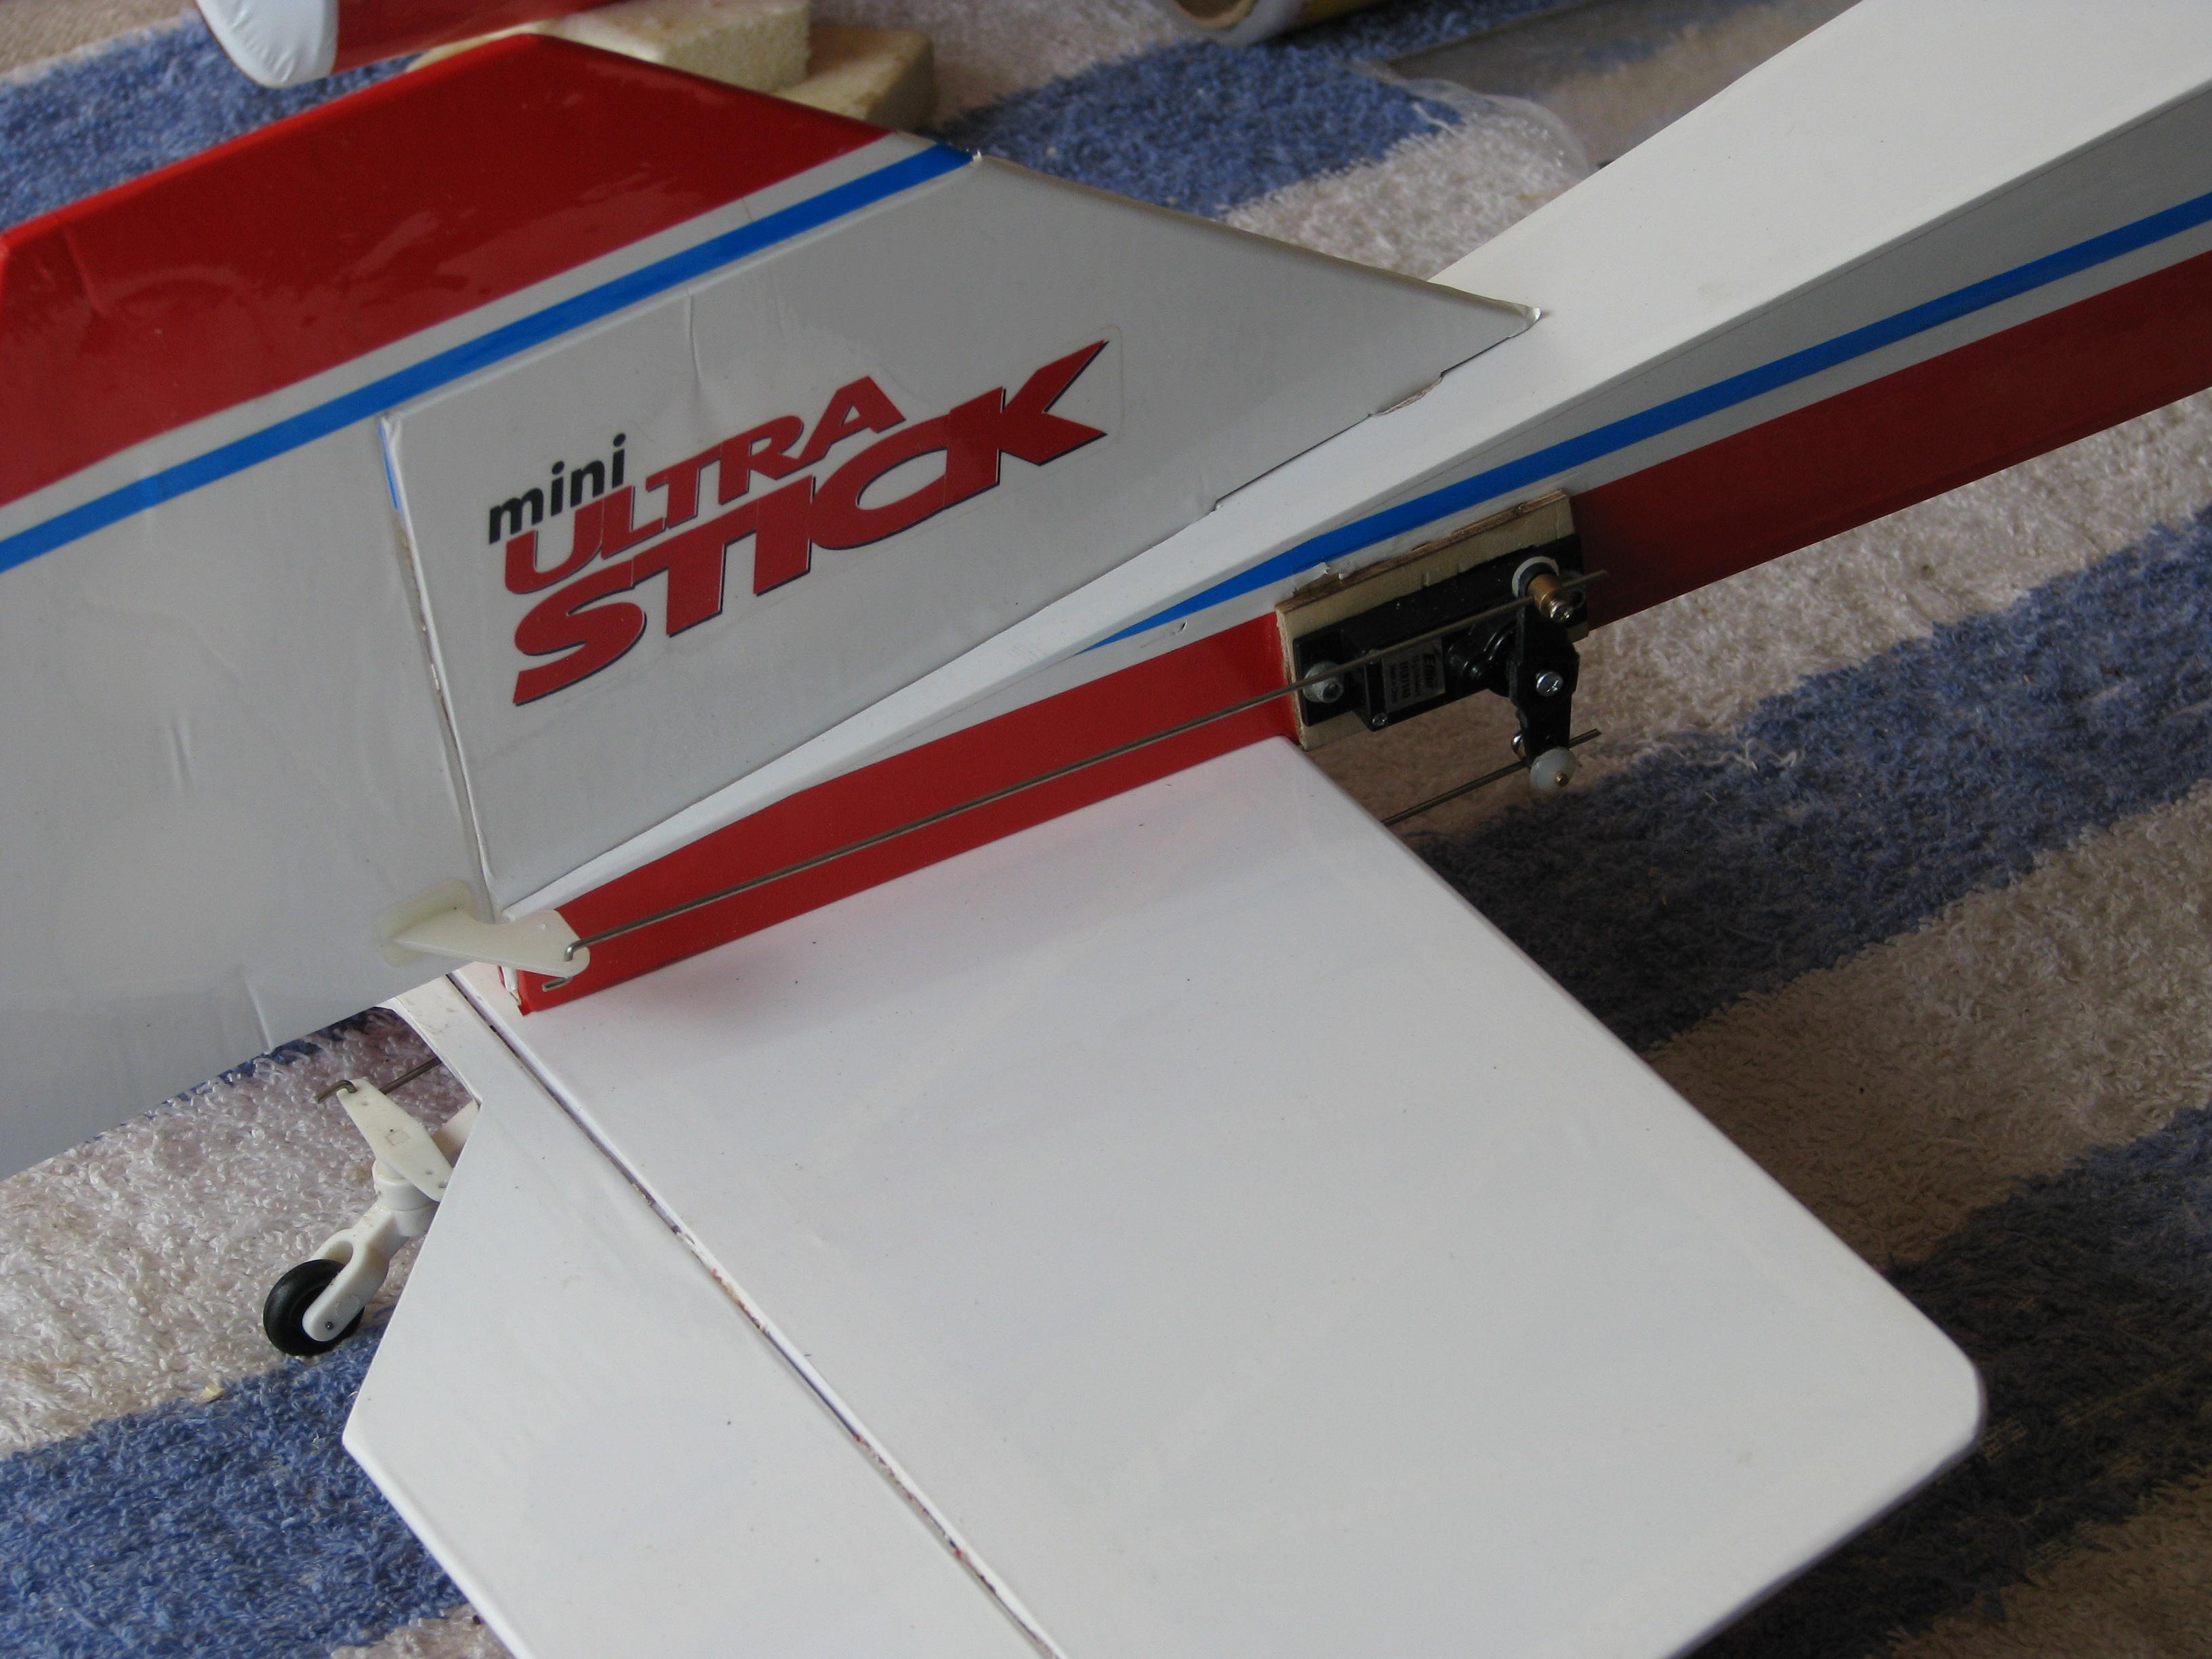 Click image for larger version  Name:Mini Ulta Stick 004.JPG Views:32 Size:1.59 MB ID:2123652